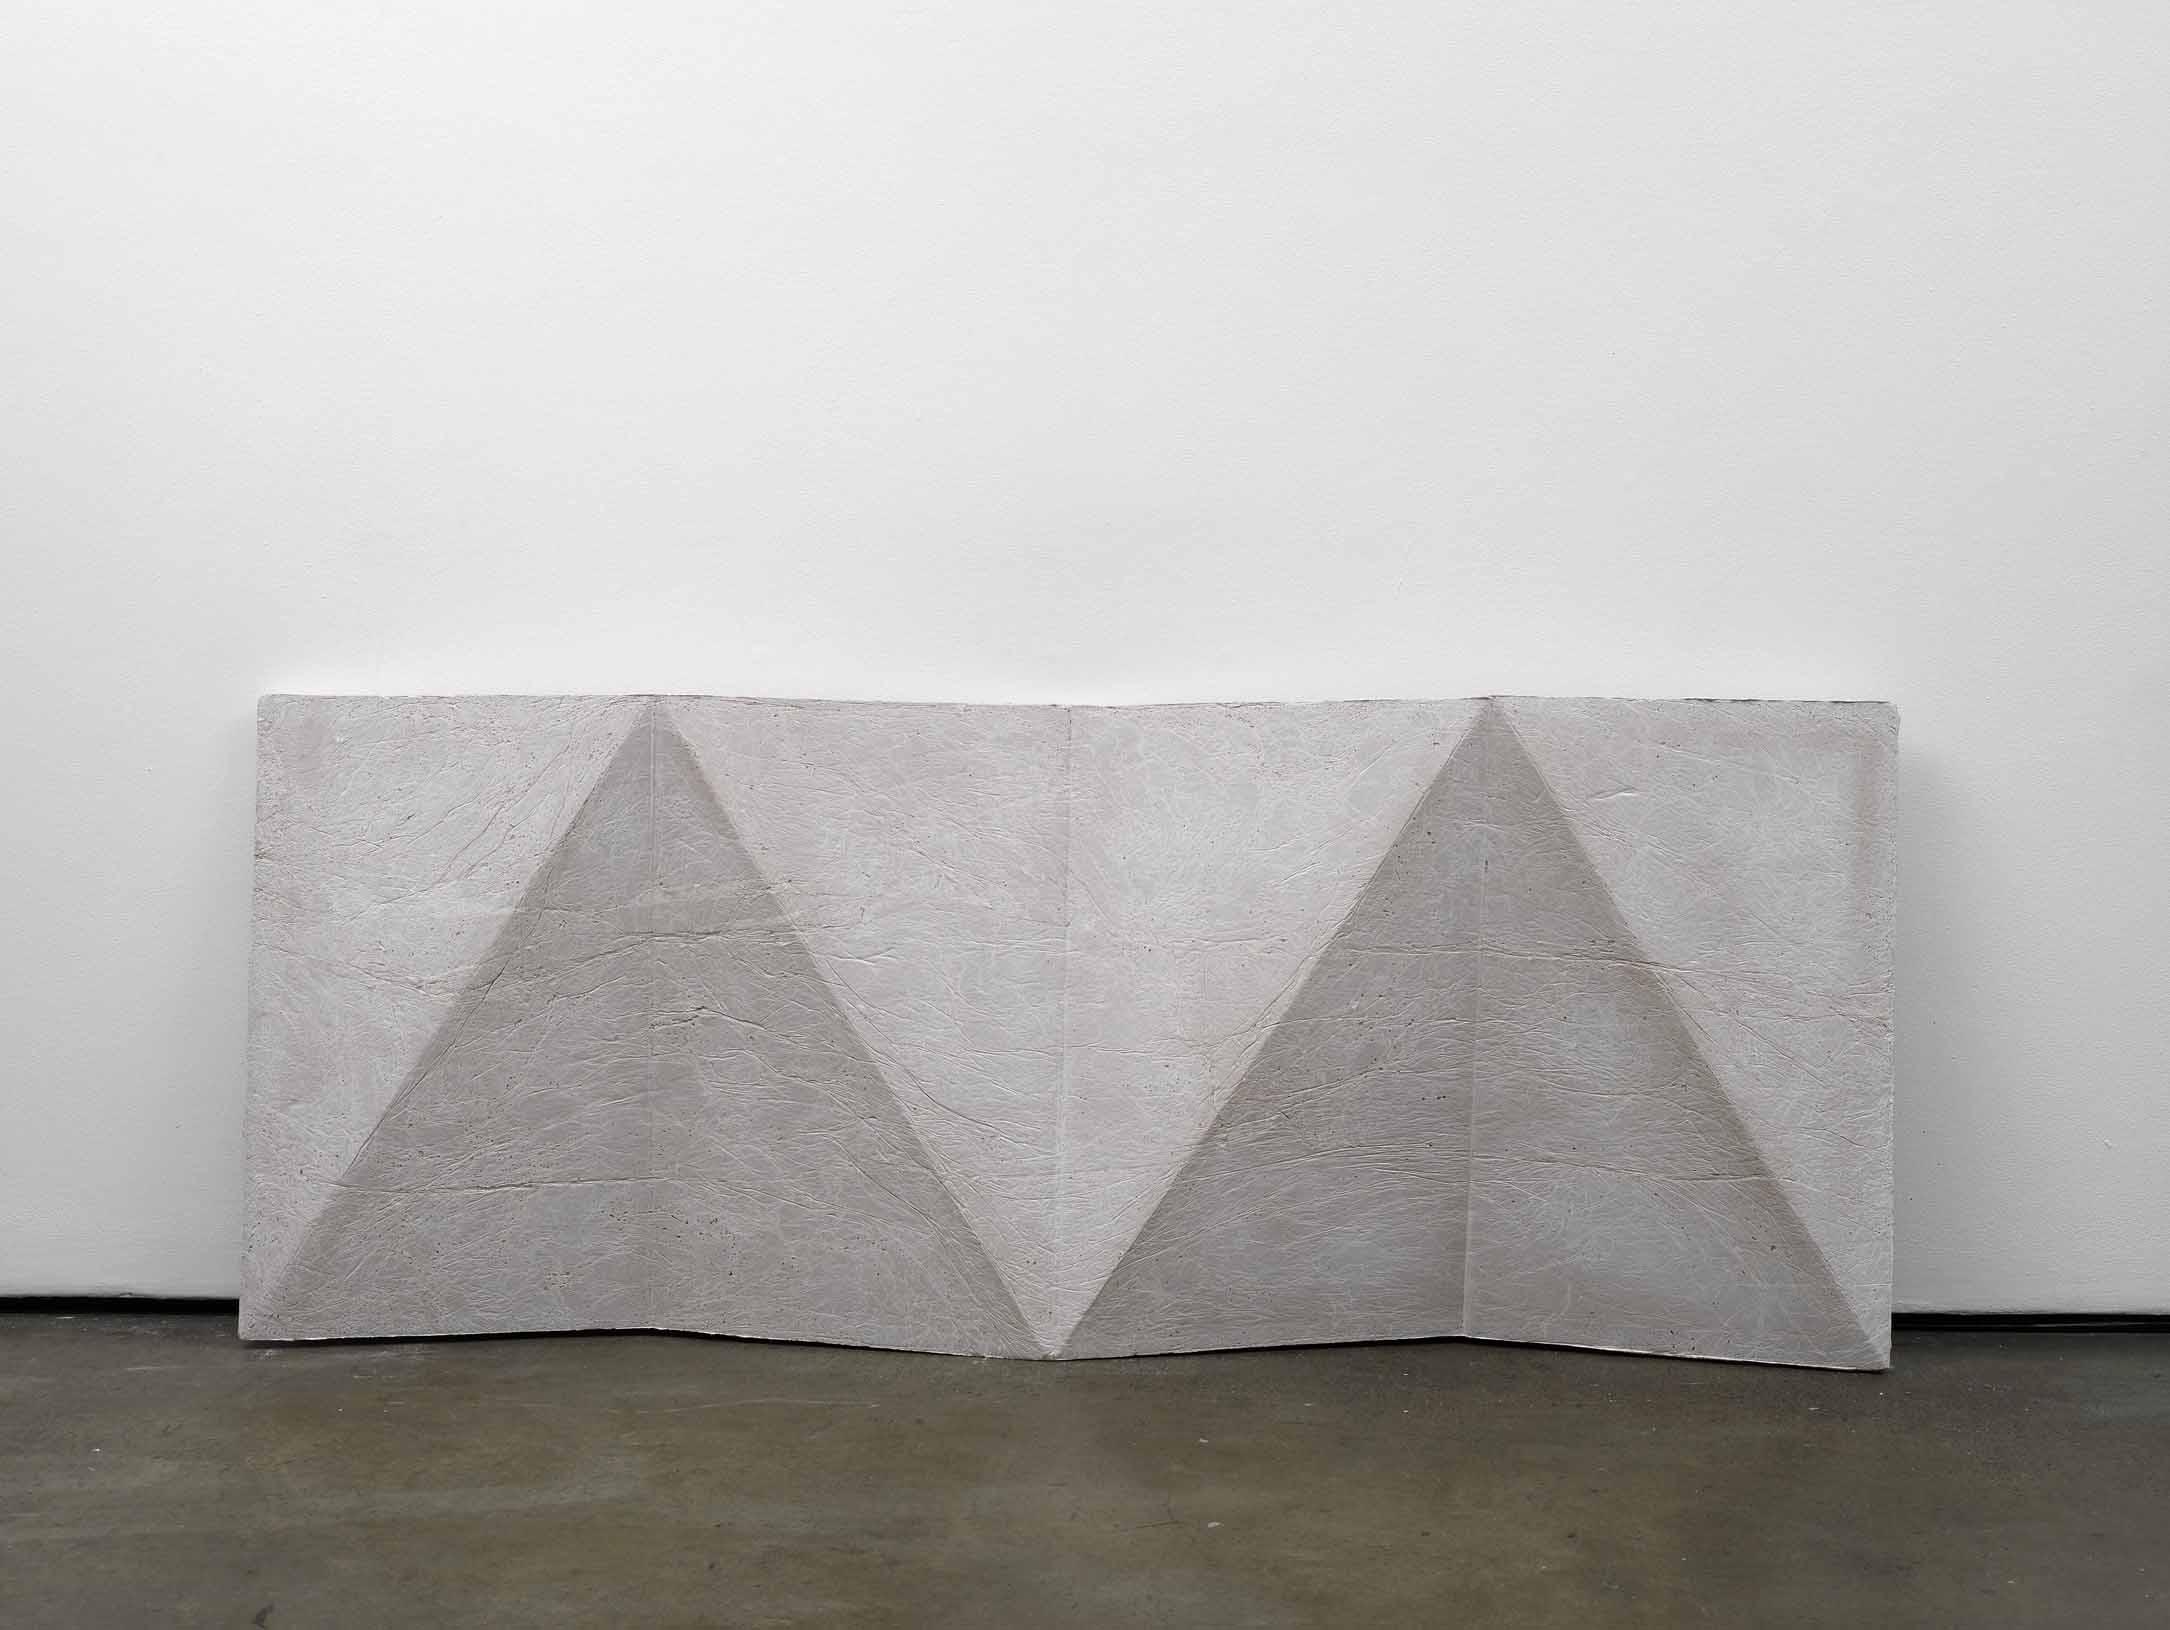 cope (working title)   2011   Concrete   78 x 198 x 14 cm / 30.7 x 78 x 5.5 in